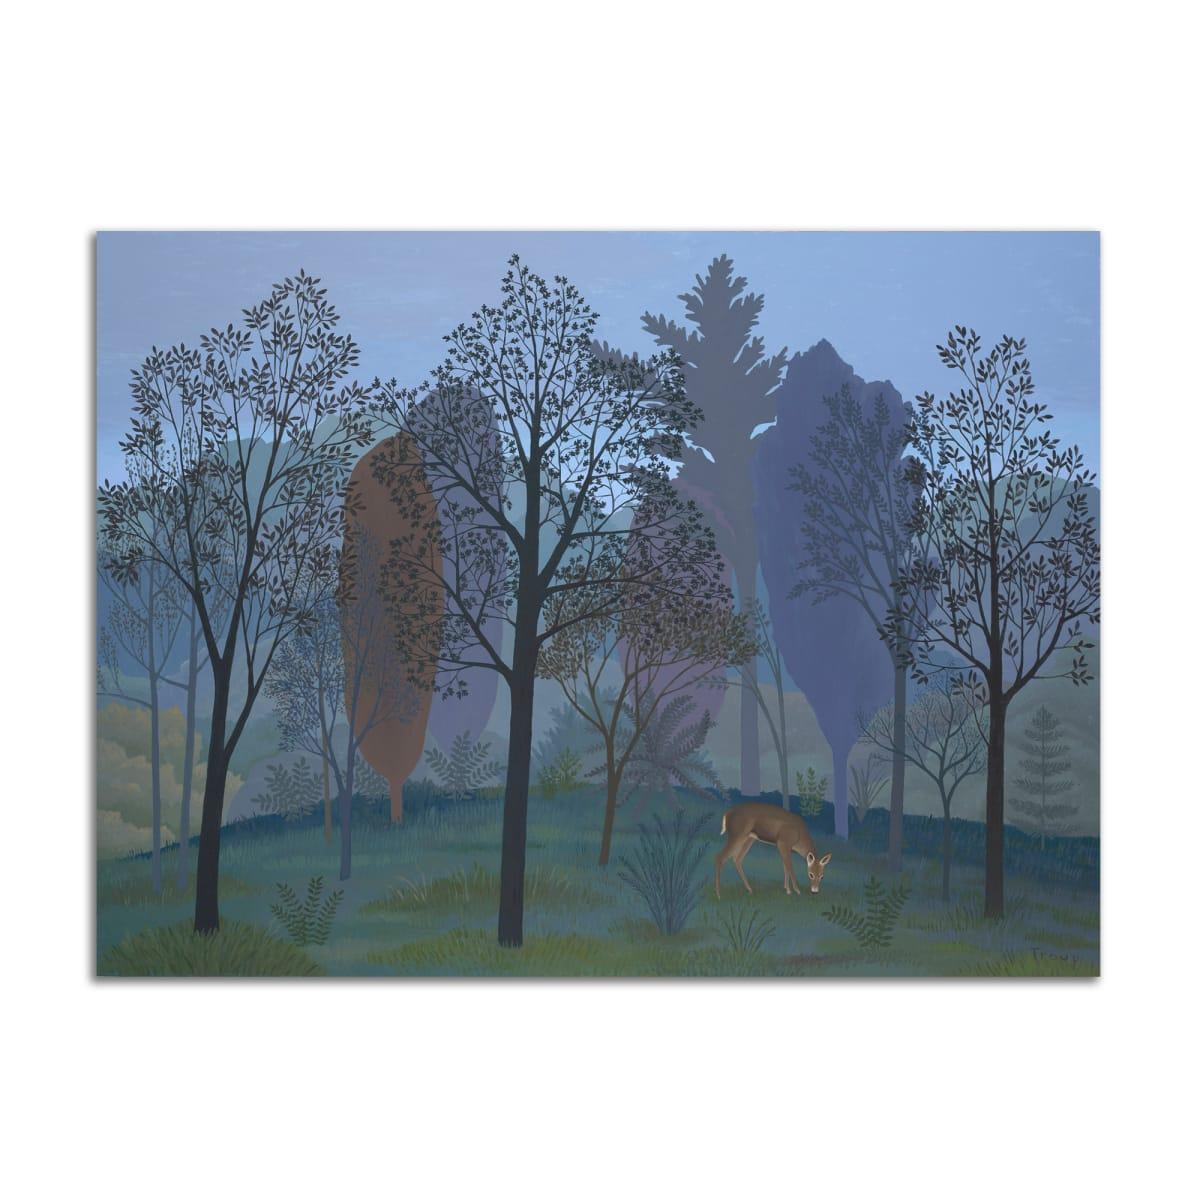 Landscape in Grays by Jane Troup